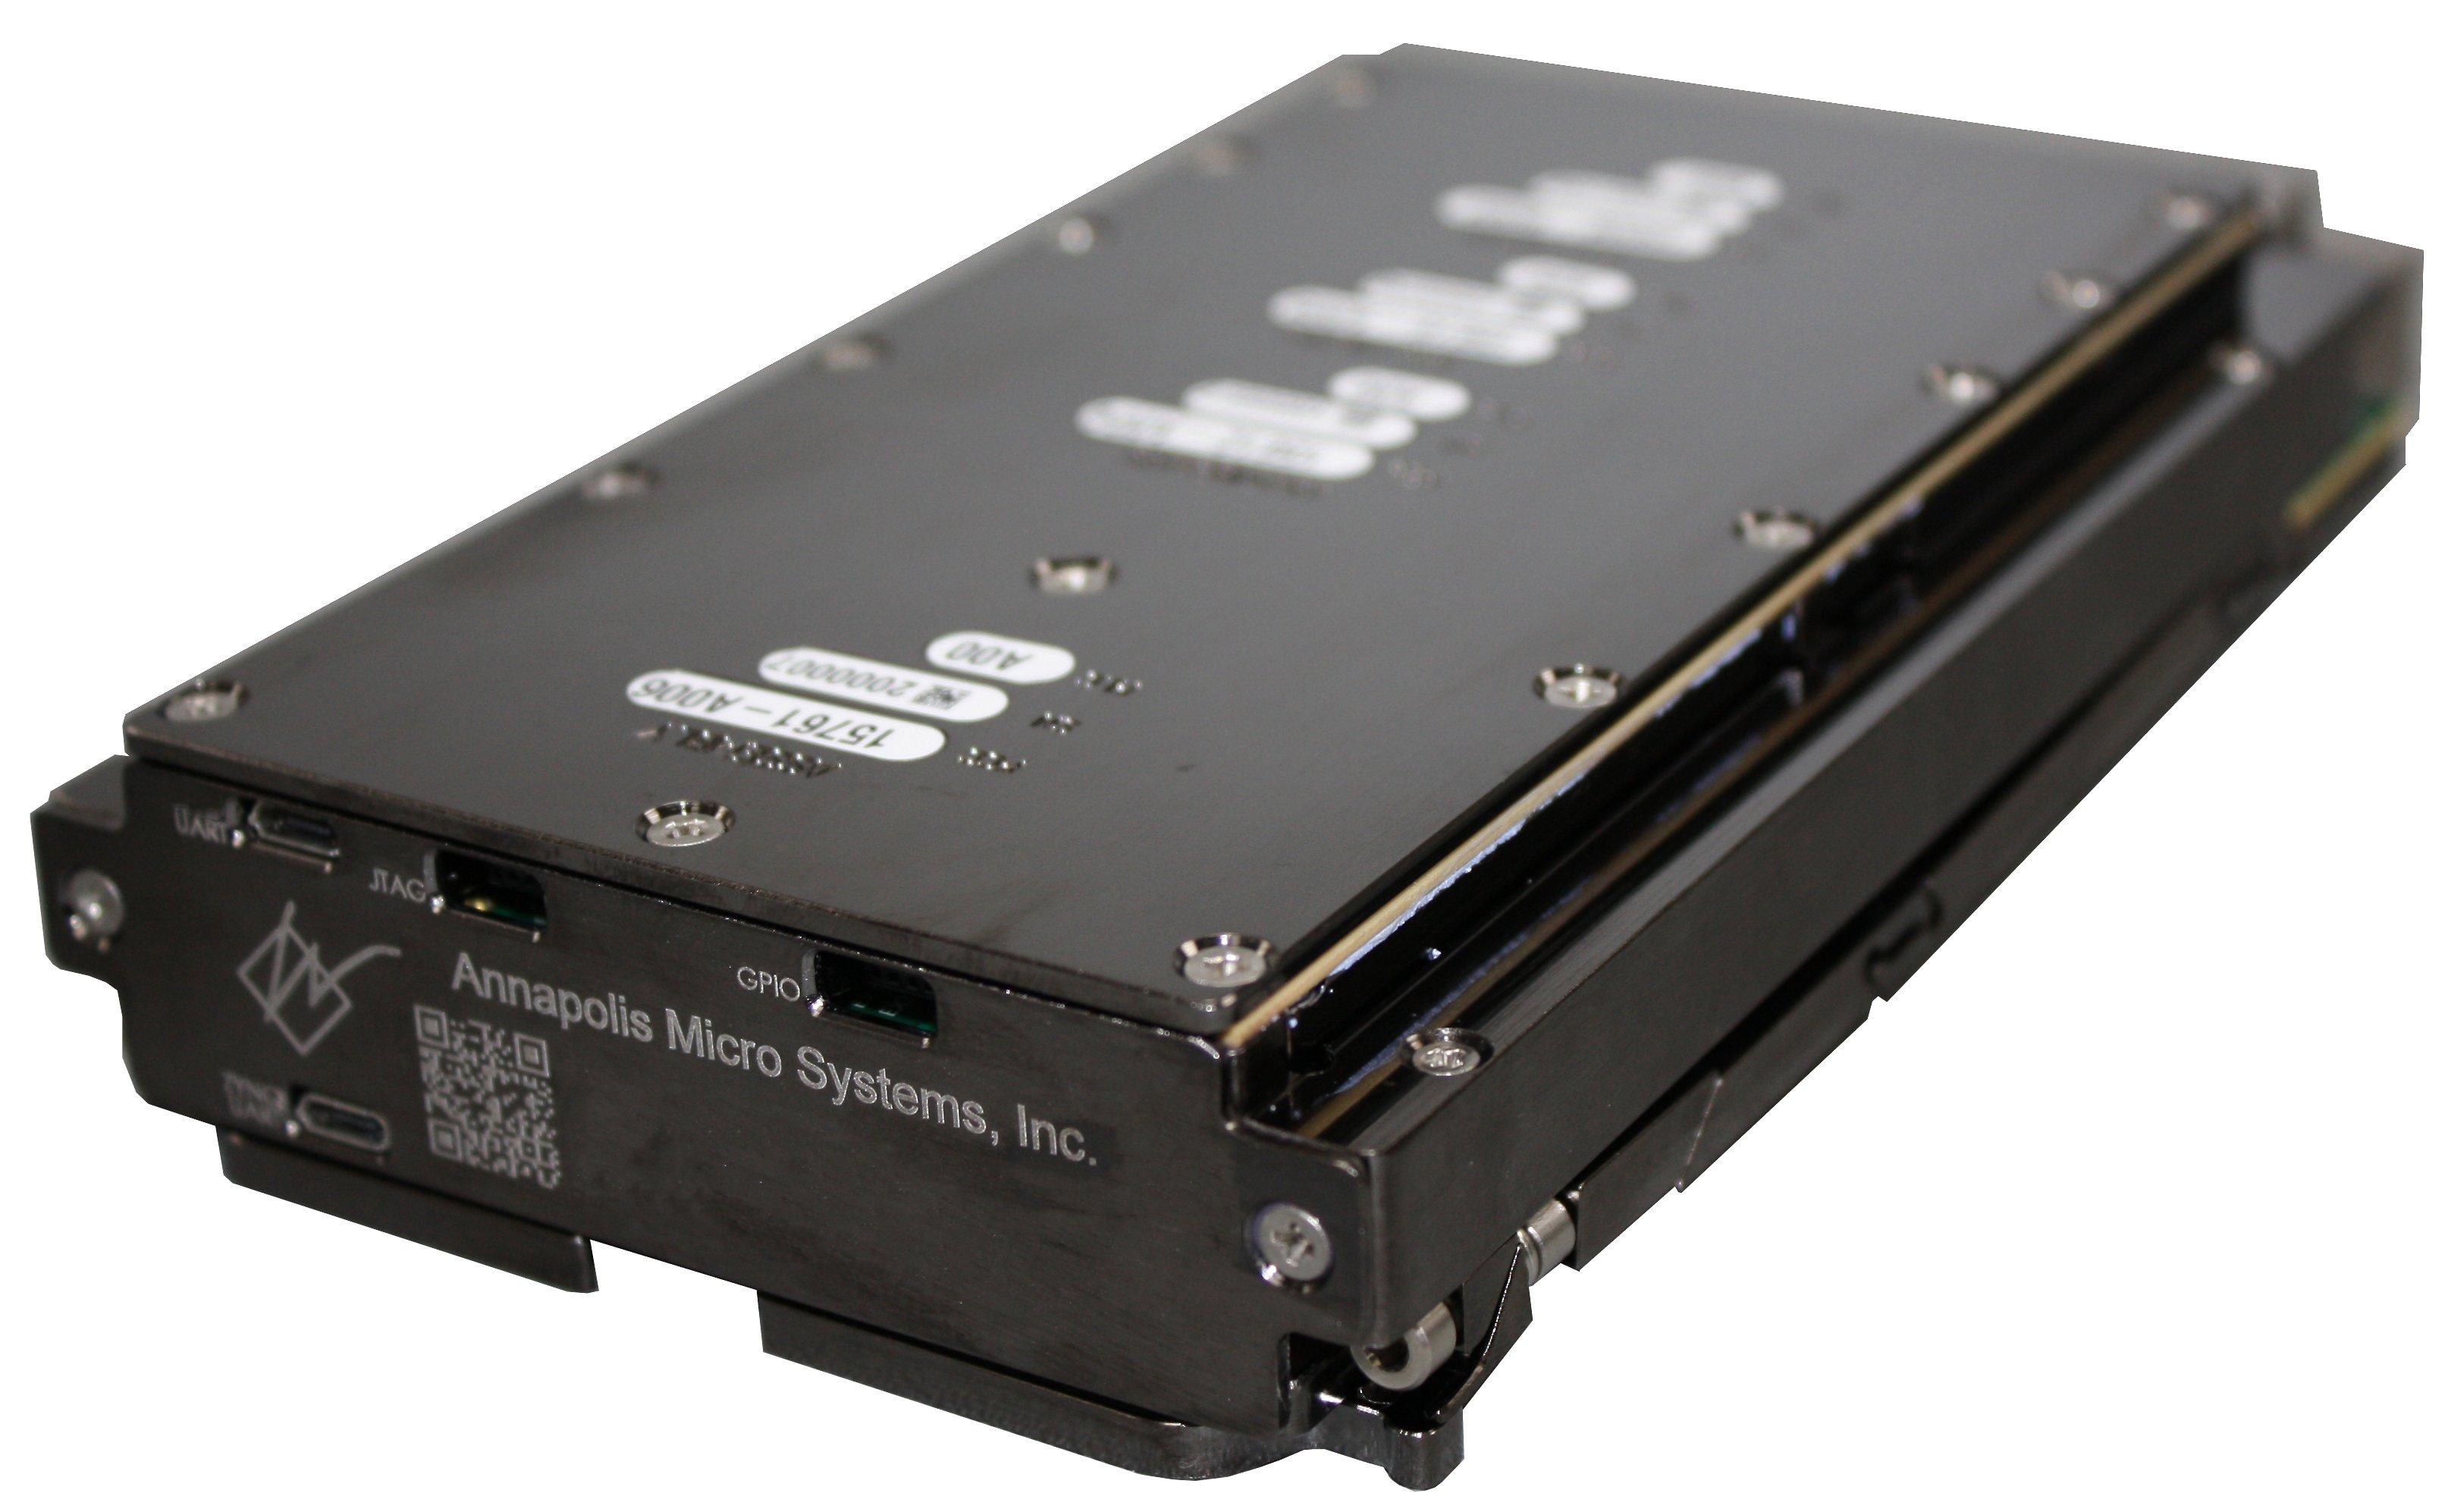 conduction cooled fpga module - Annapolis Micro Systems, Inc